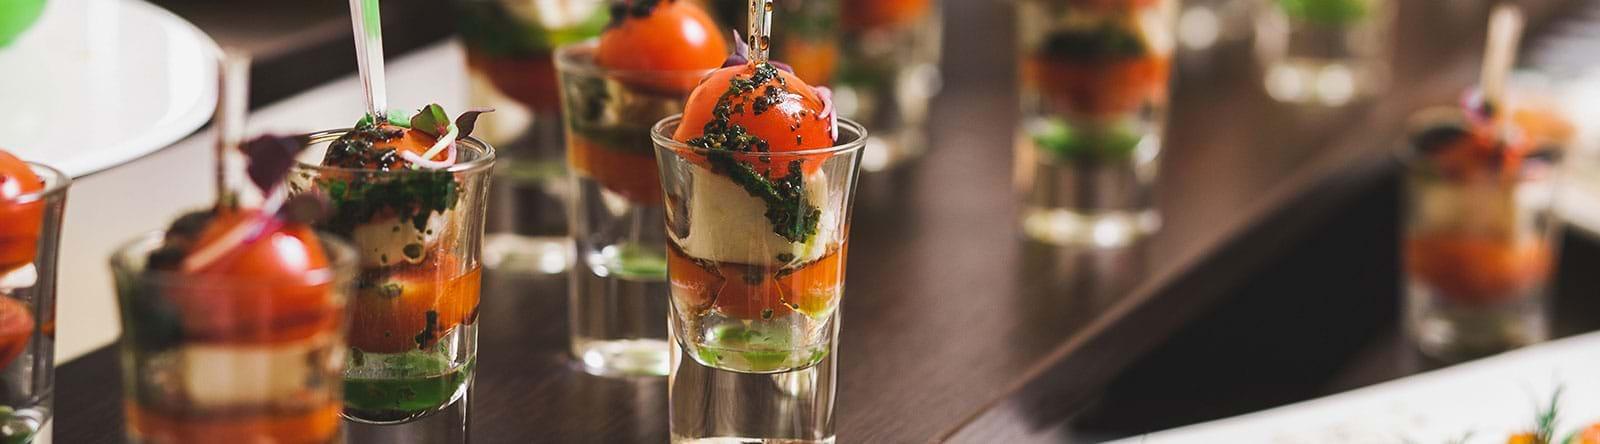 Empfang Impression Salat